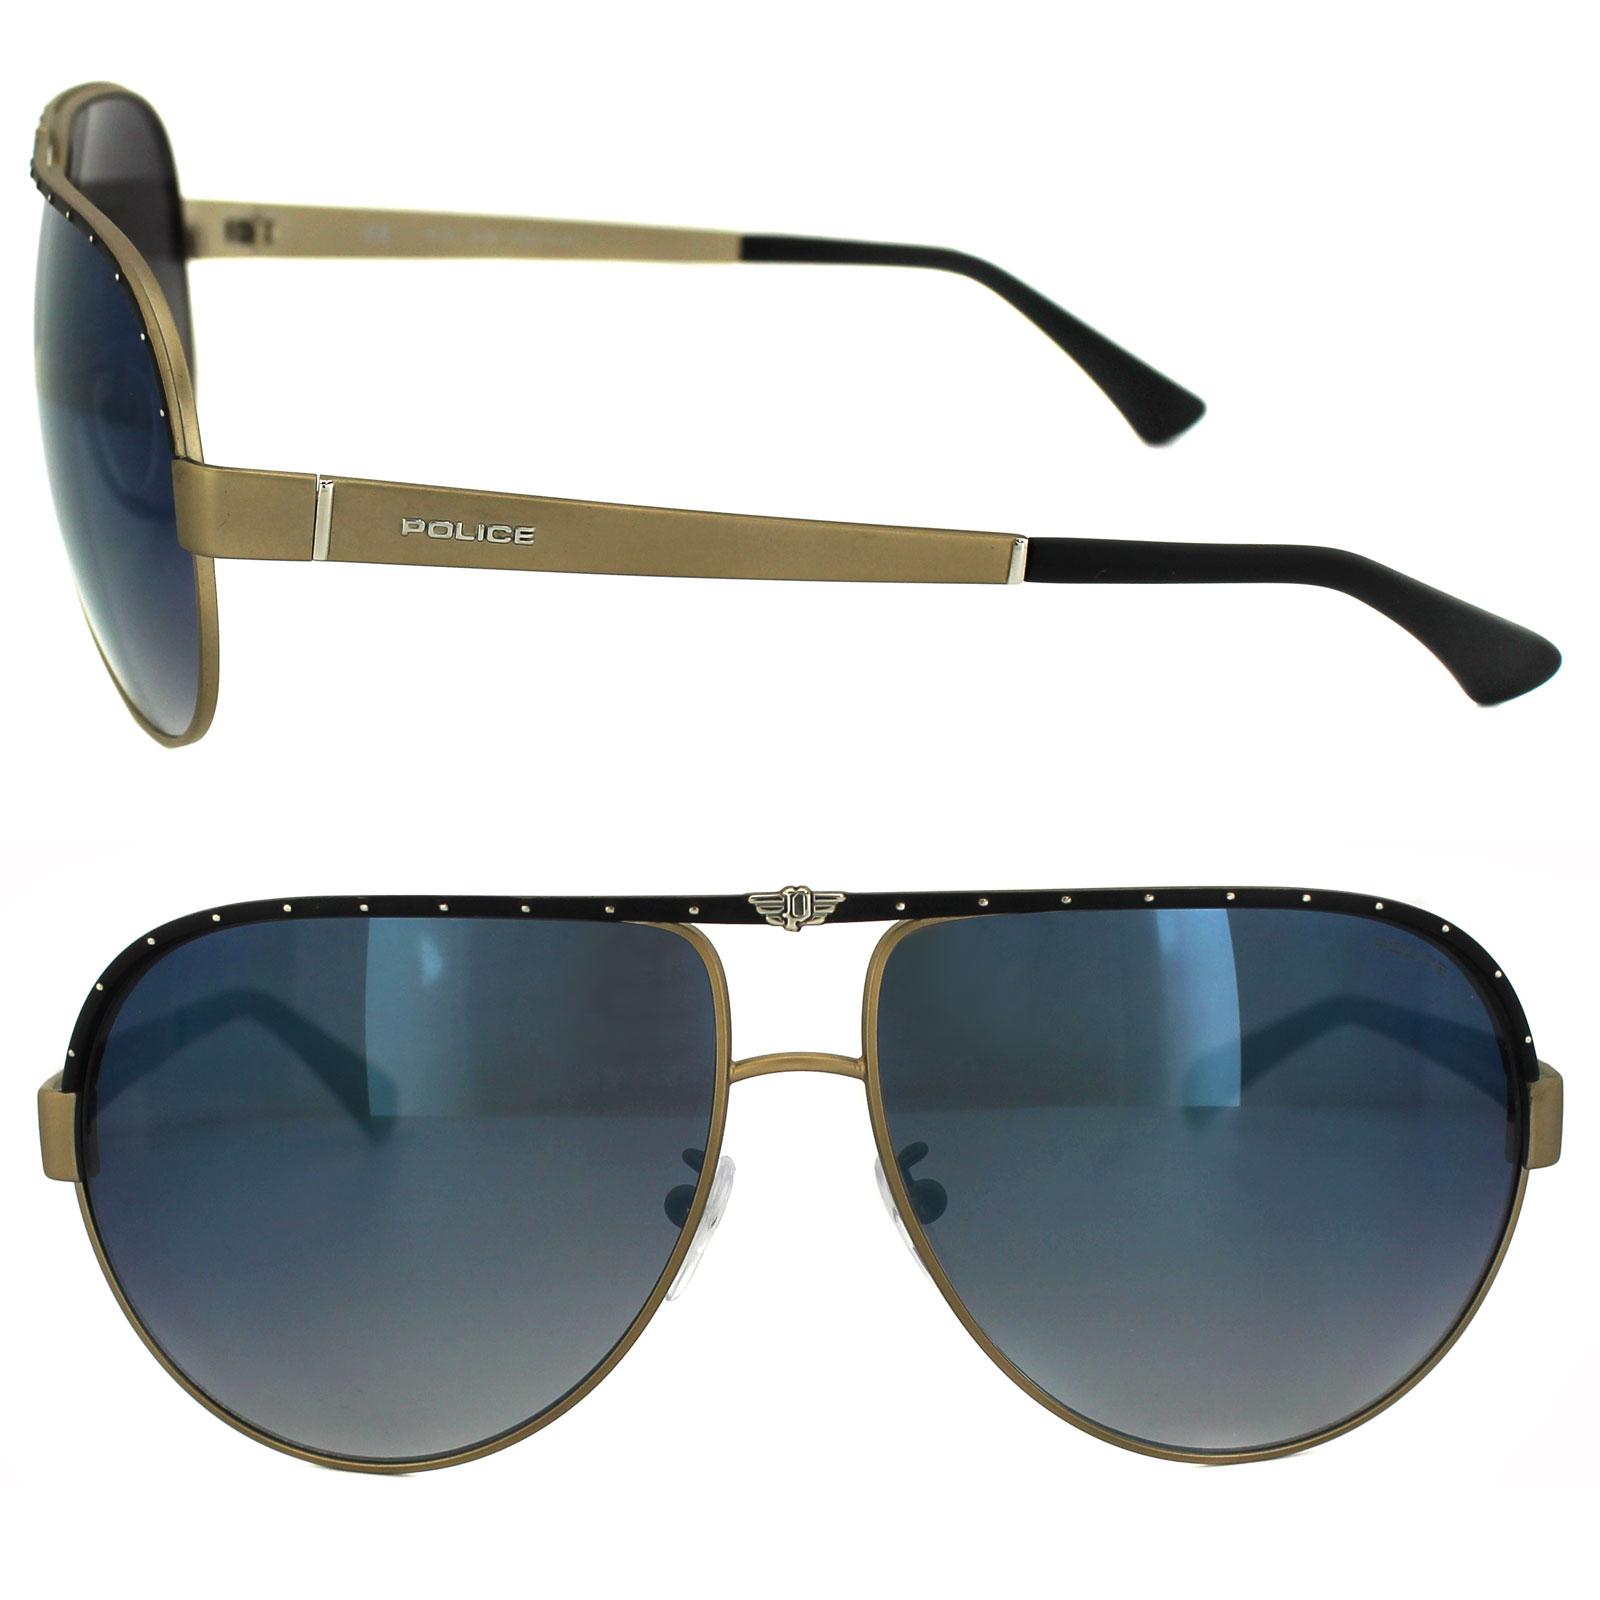 Police Sunglasses S8844 Spark 1 8H5X Gunmetal Grey